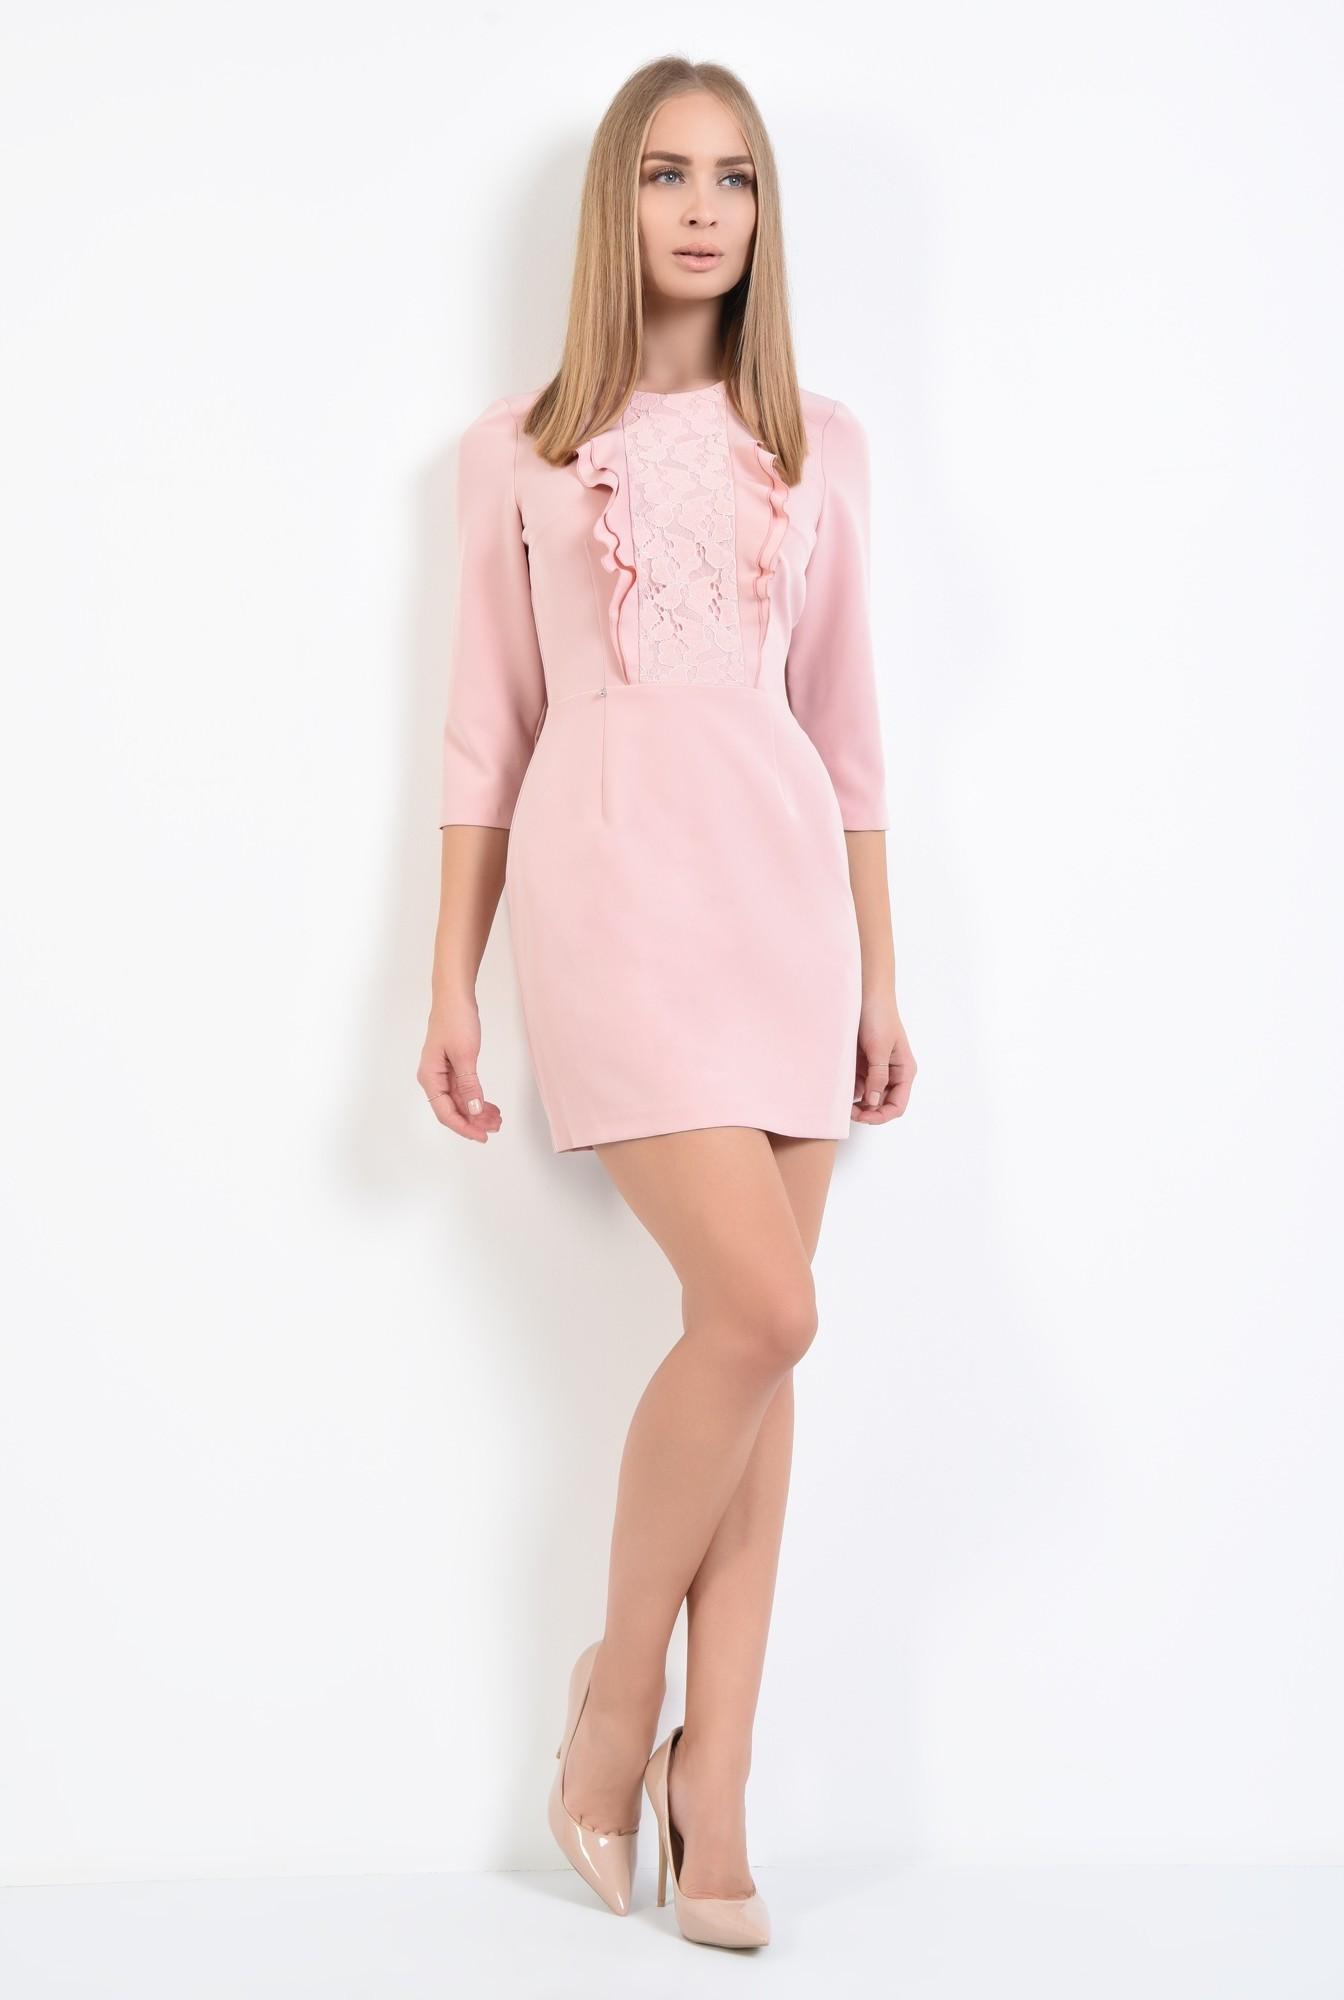 3 - rochie de ocazie, scurta, roz, volane, decolteu rotund